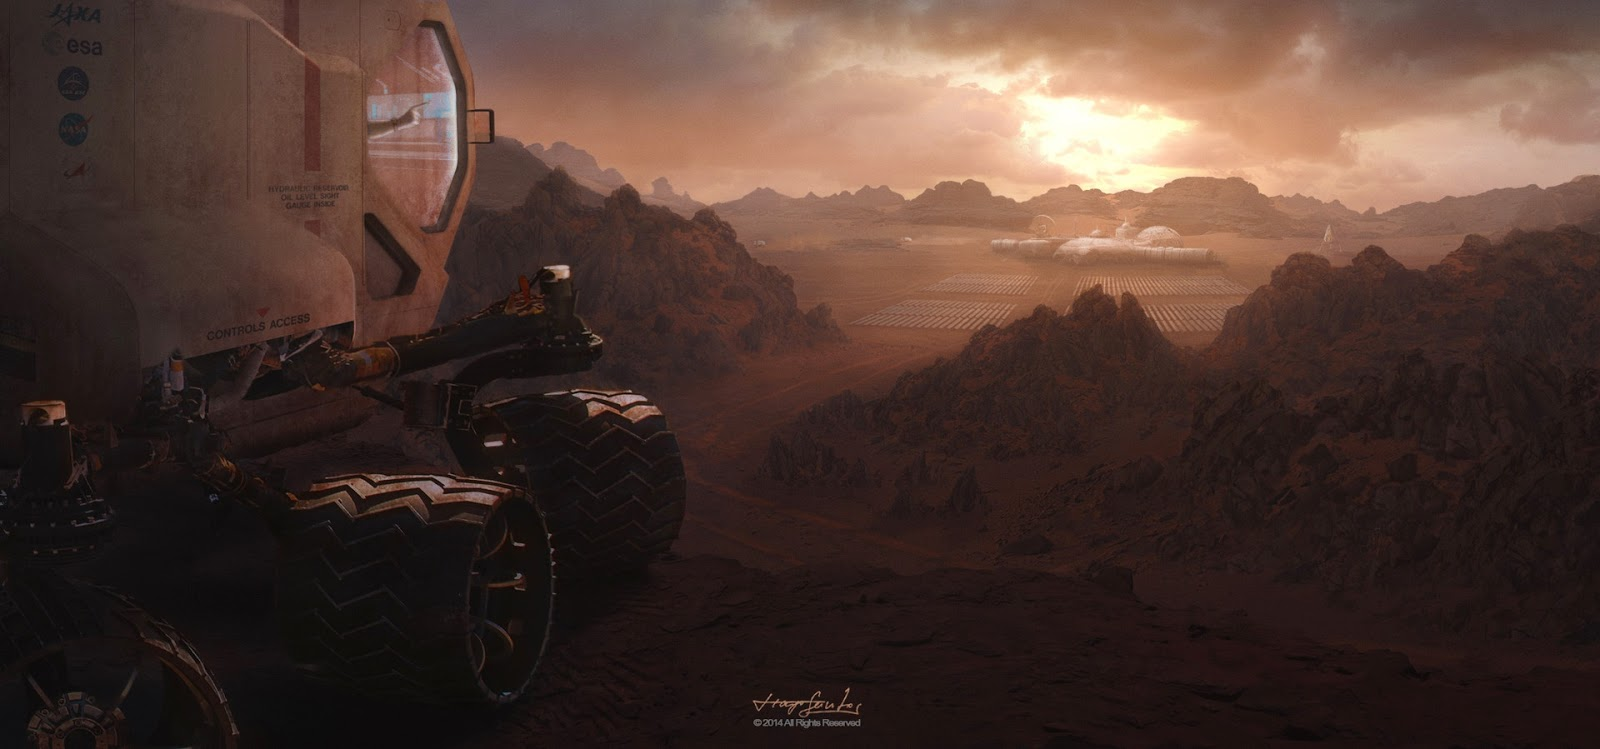 Rover approaching Mars base by Tiago Santos